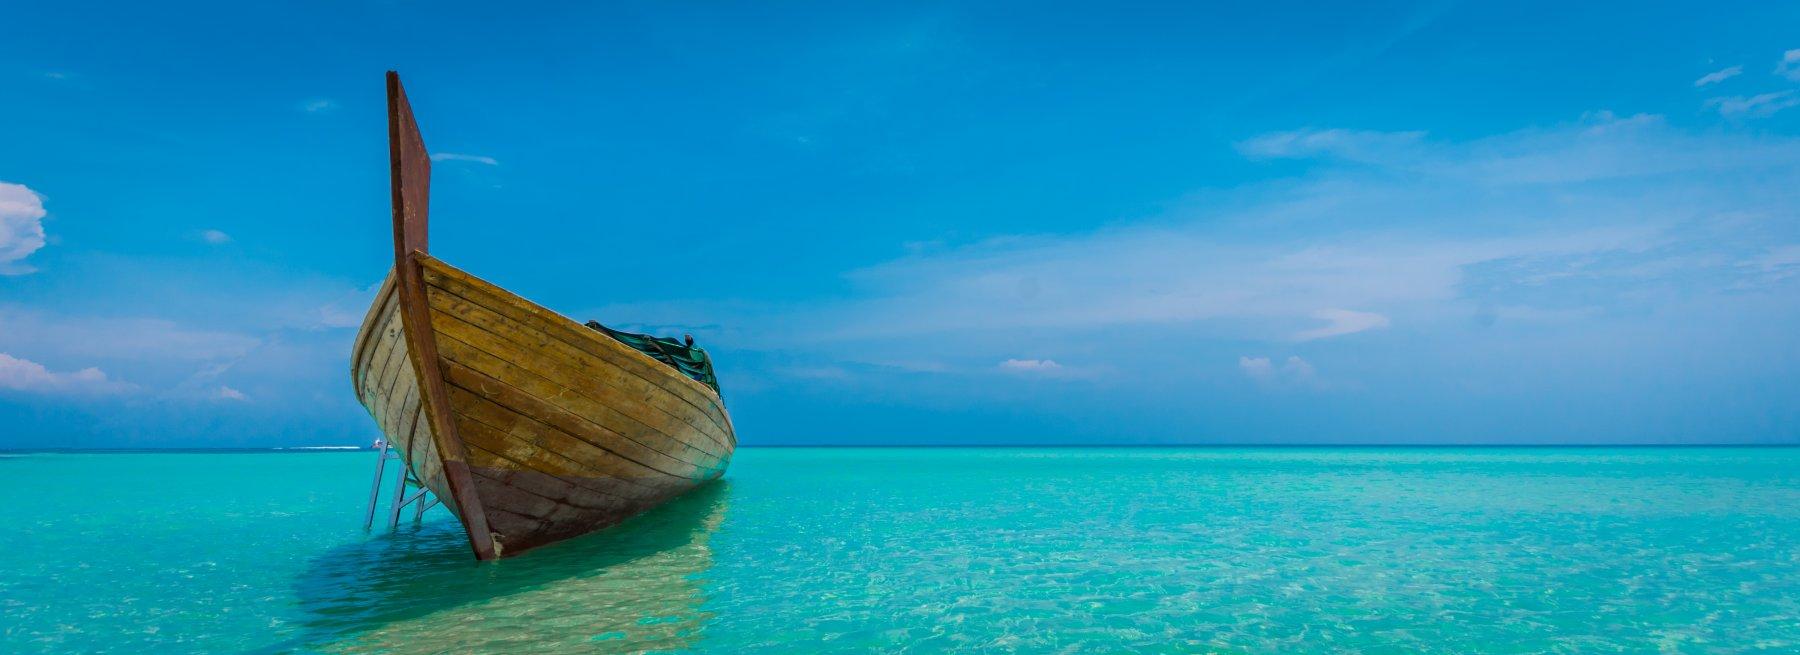 Indonesia snorkeling Boat